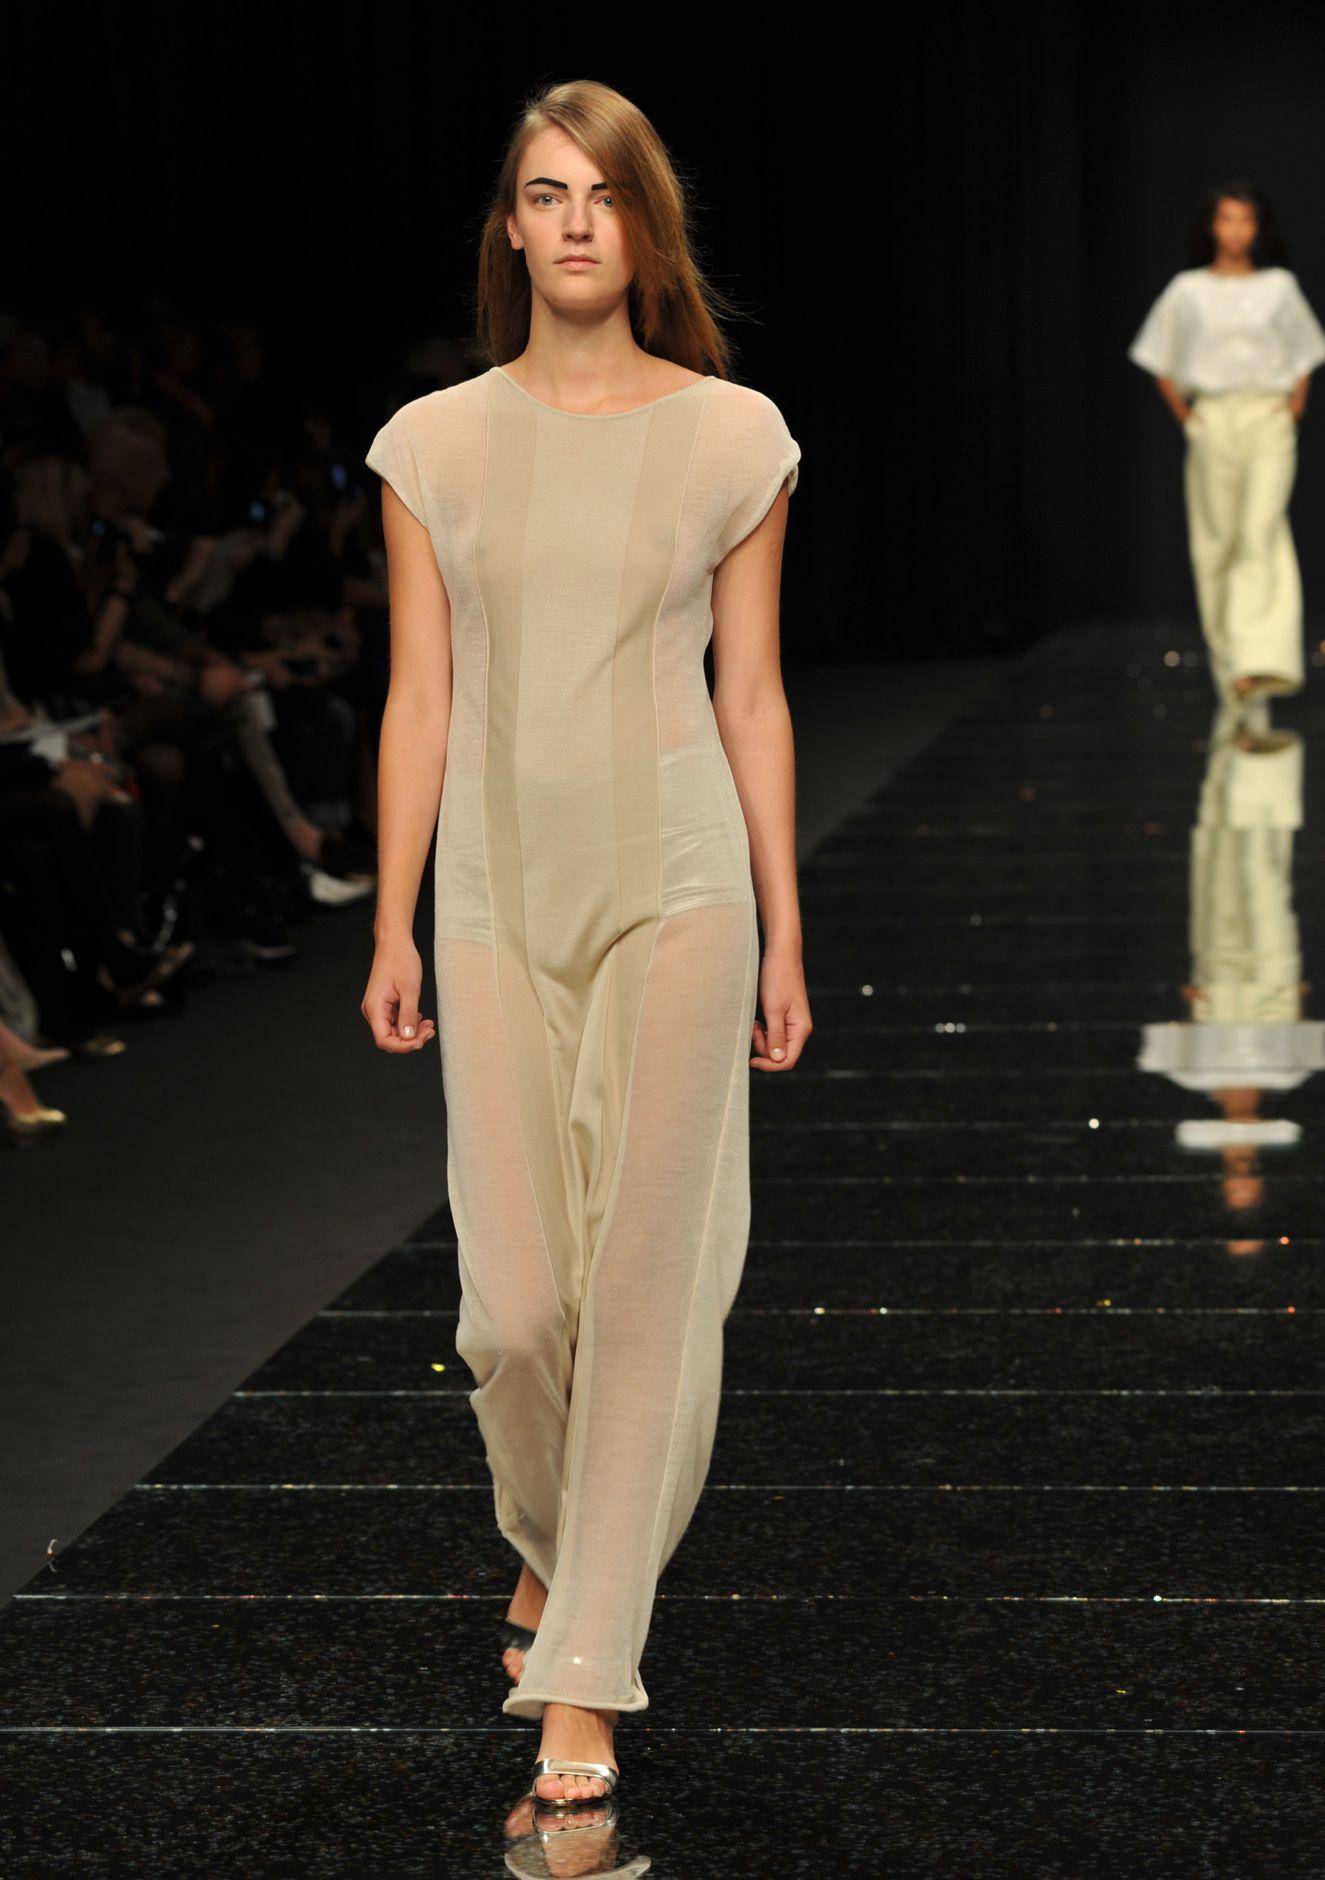 Anteprima Spring 2013 Collection Milano Fashion Week